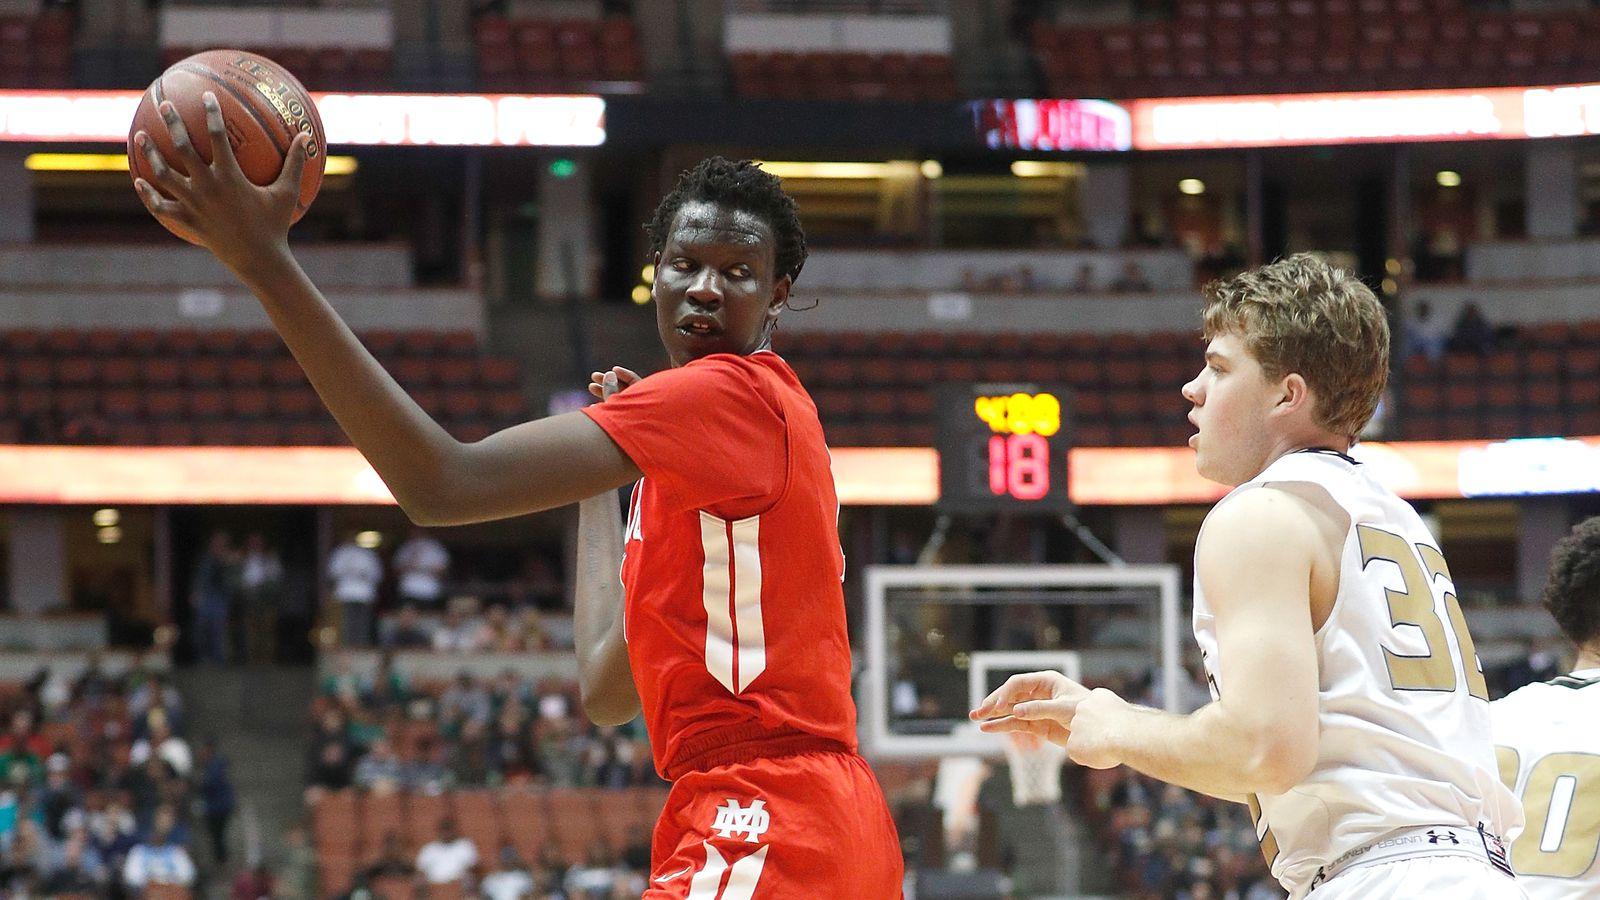 Uk Basketball: Arizona Basketball Recruiting: A Look At The Wildcats